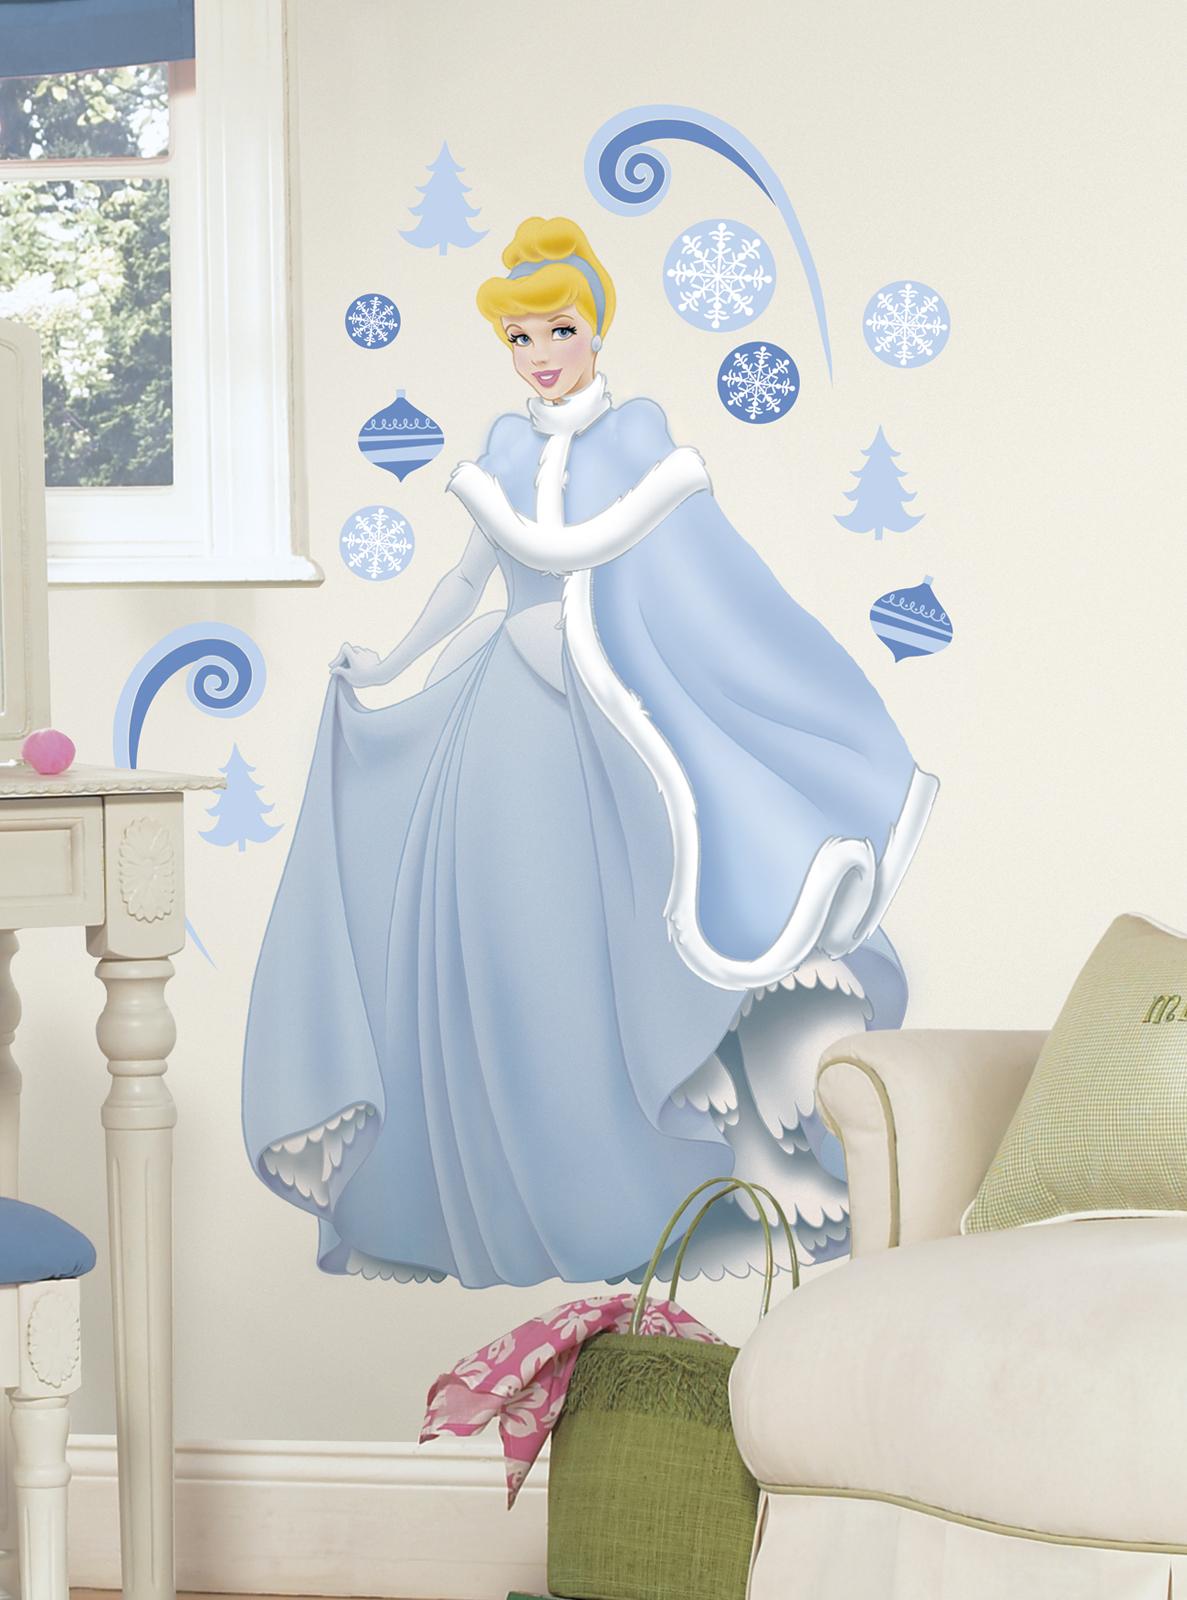 RoomMates Disney Princess - Cinderella Holiday Add On